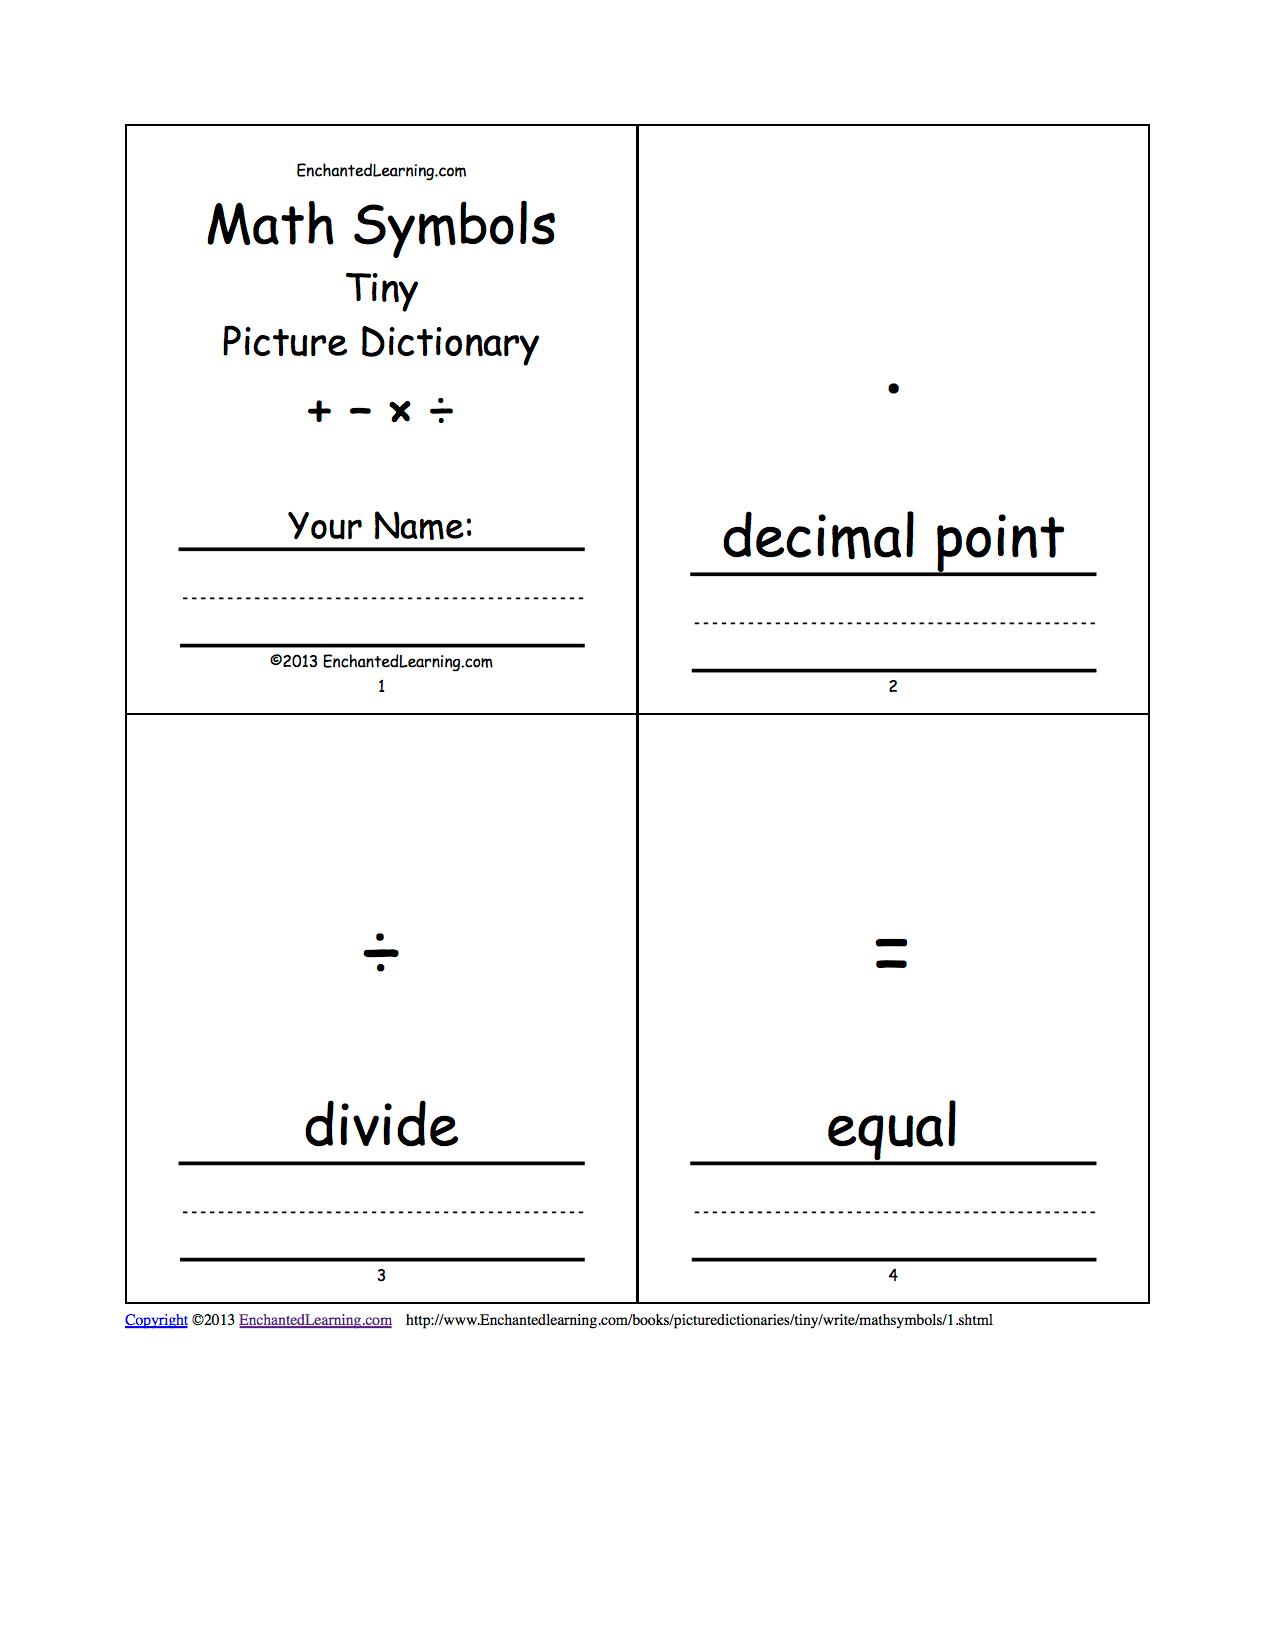 Math Symbols Tiny Picture Dictionary